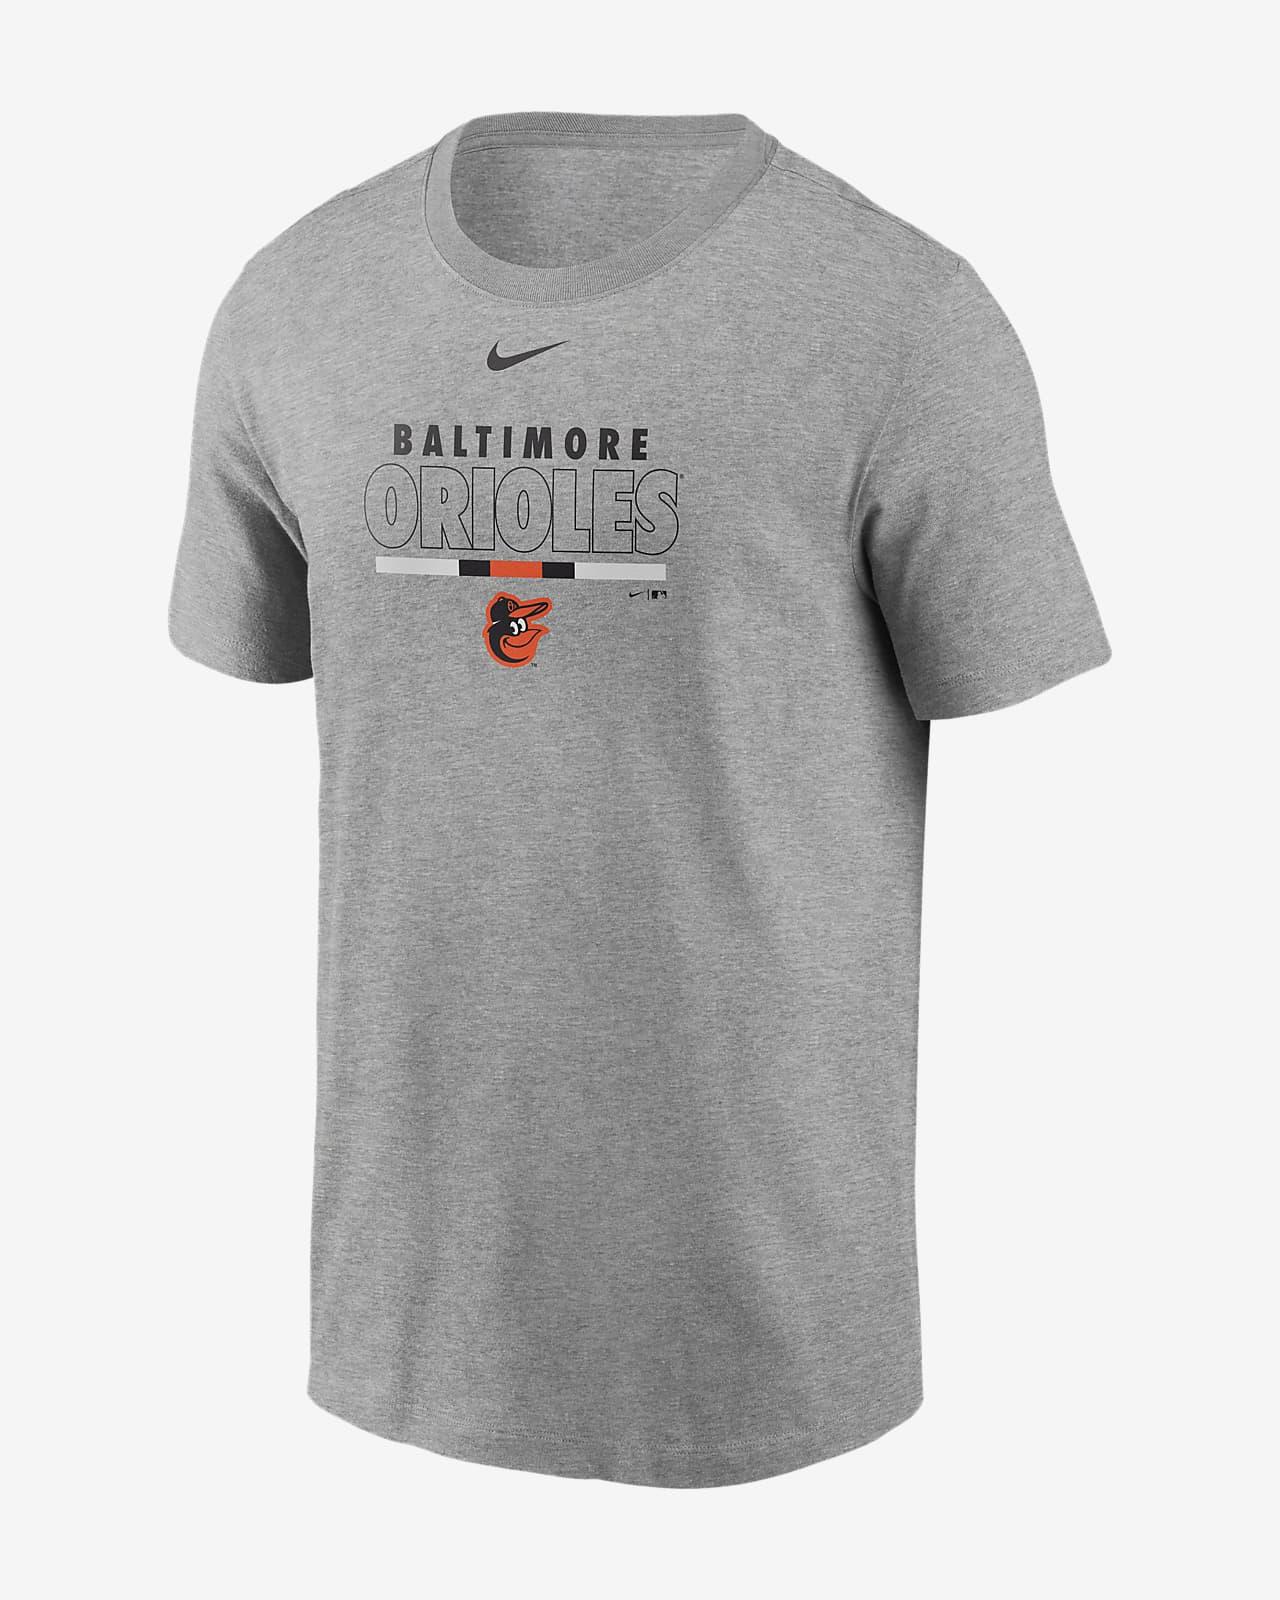 Nike Color Bar (MLB Baltimore Orioles) Men's T-Shirt